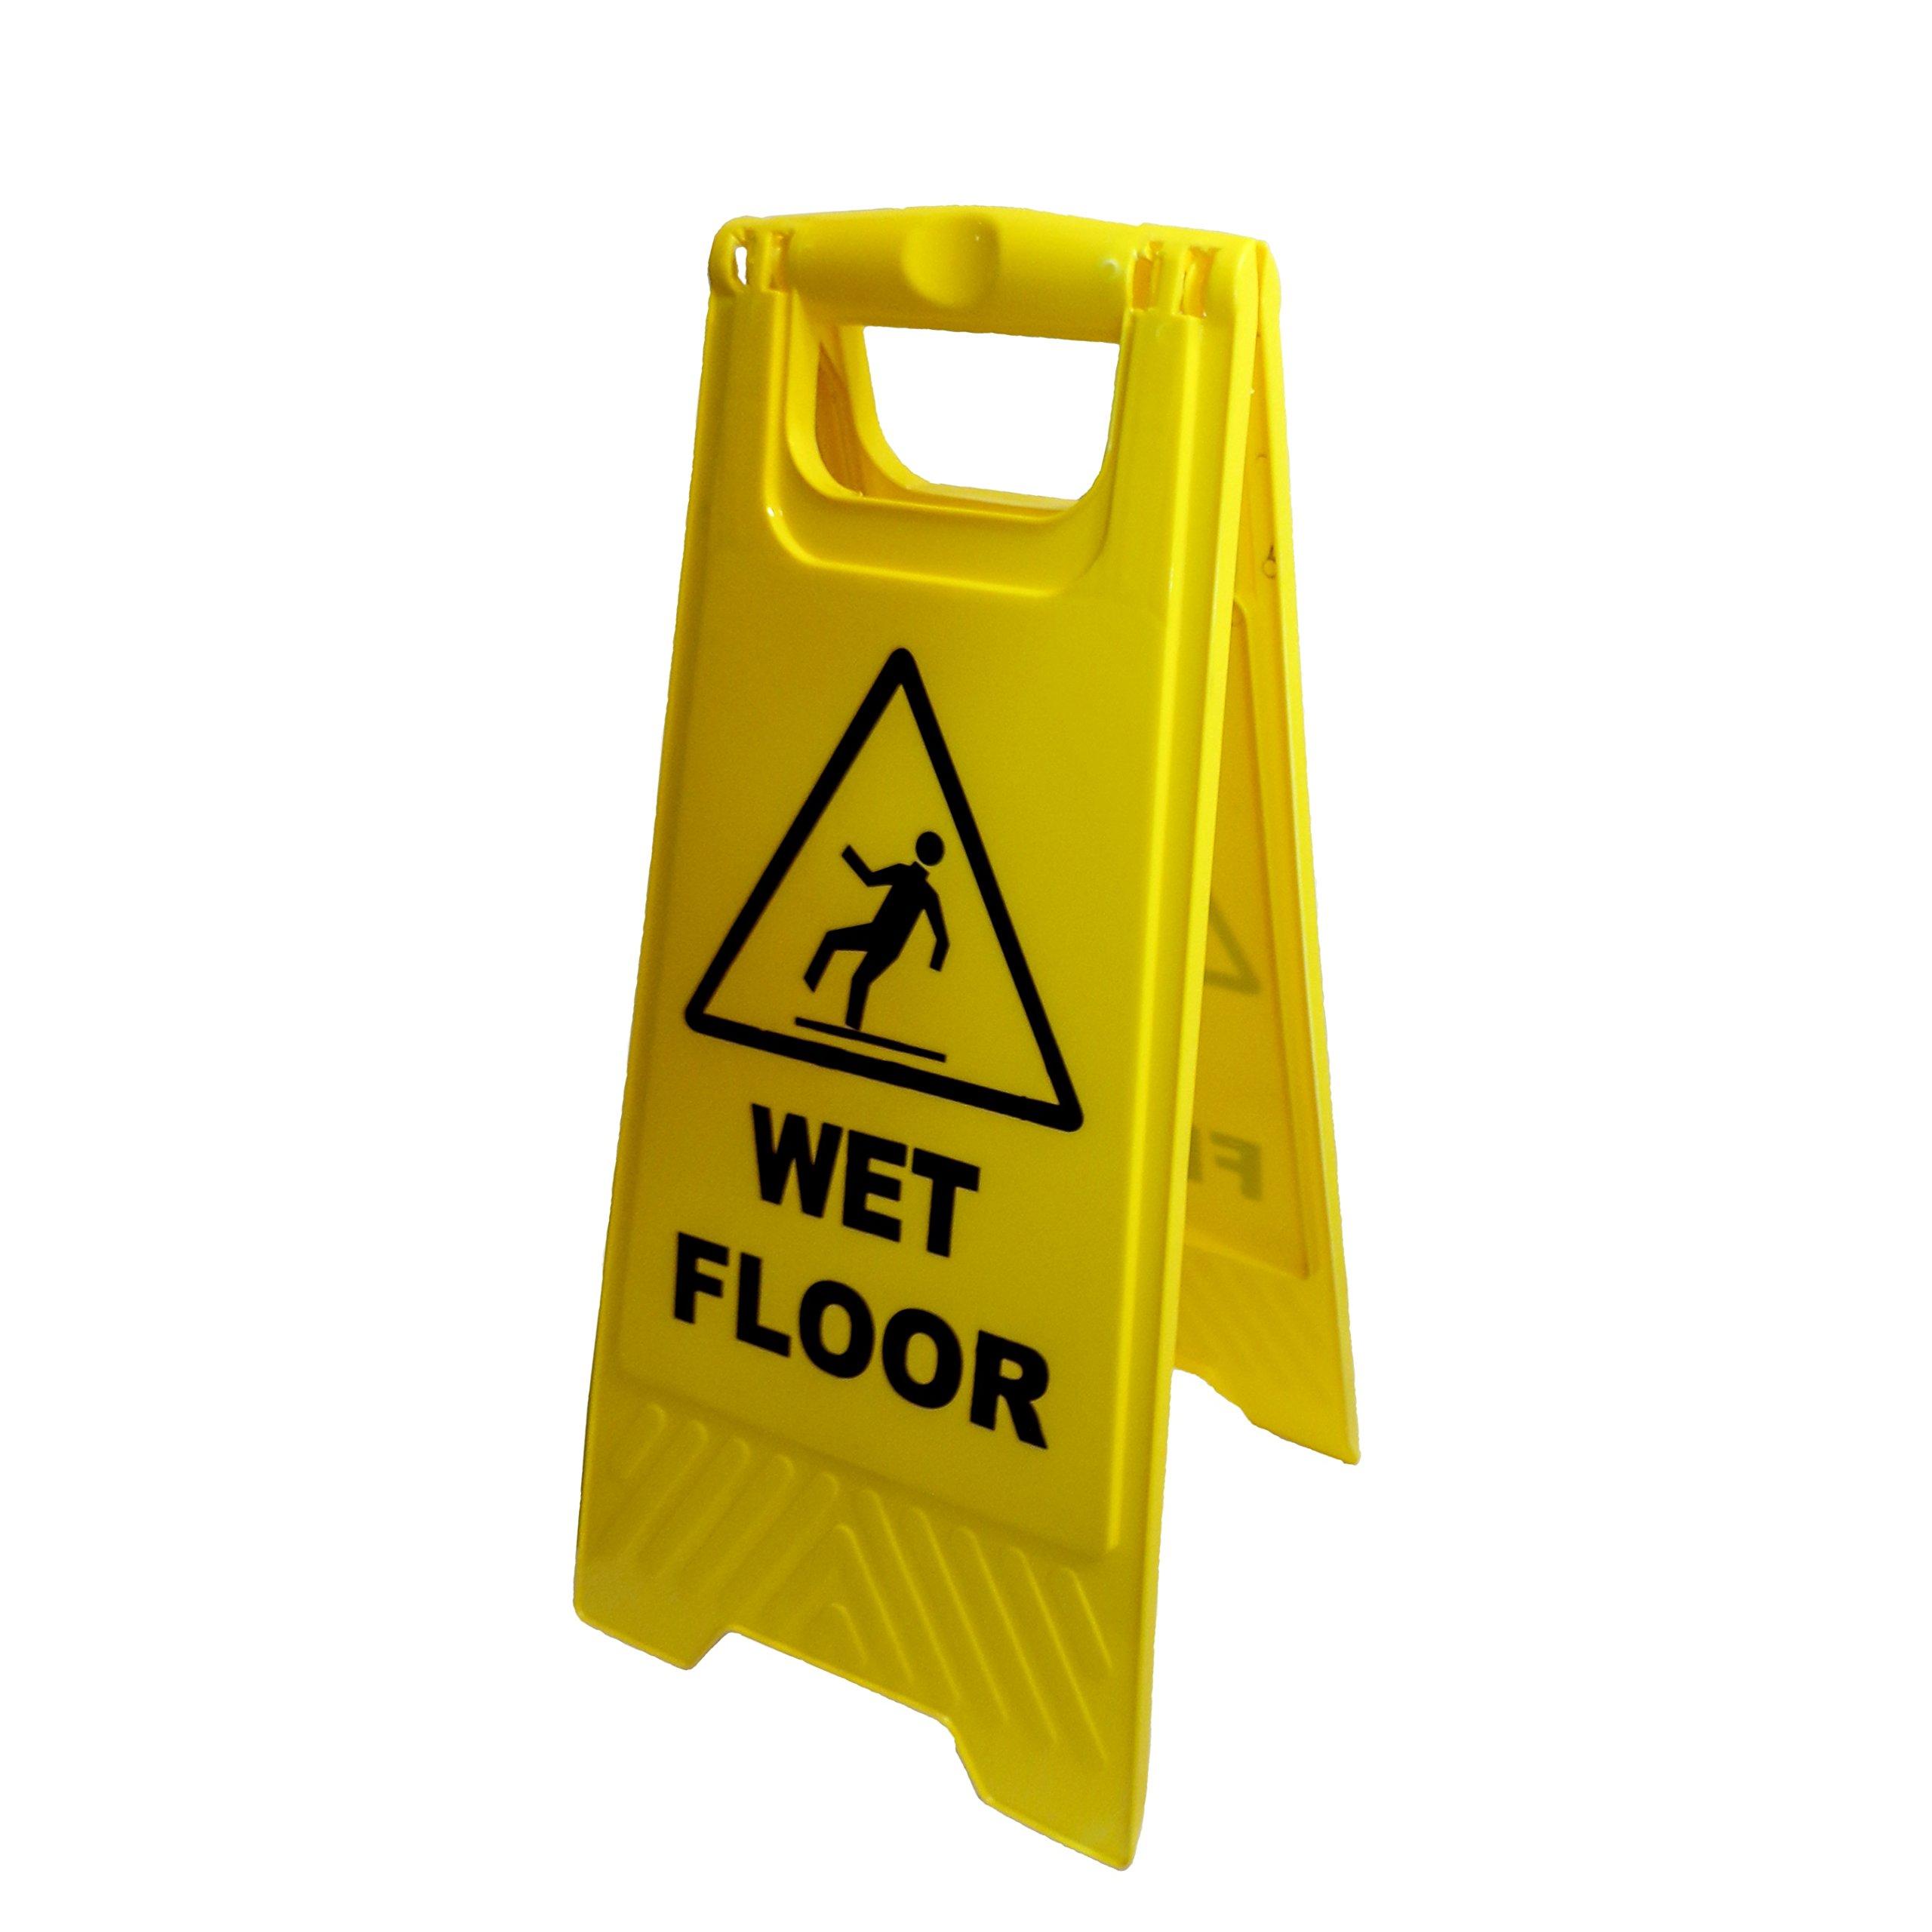 edge yellow caution sign - HD2560×2560